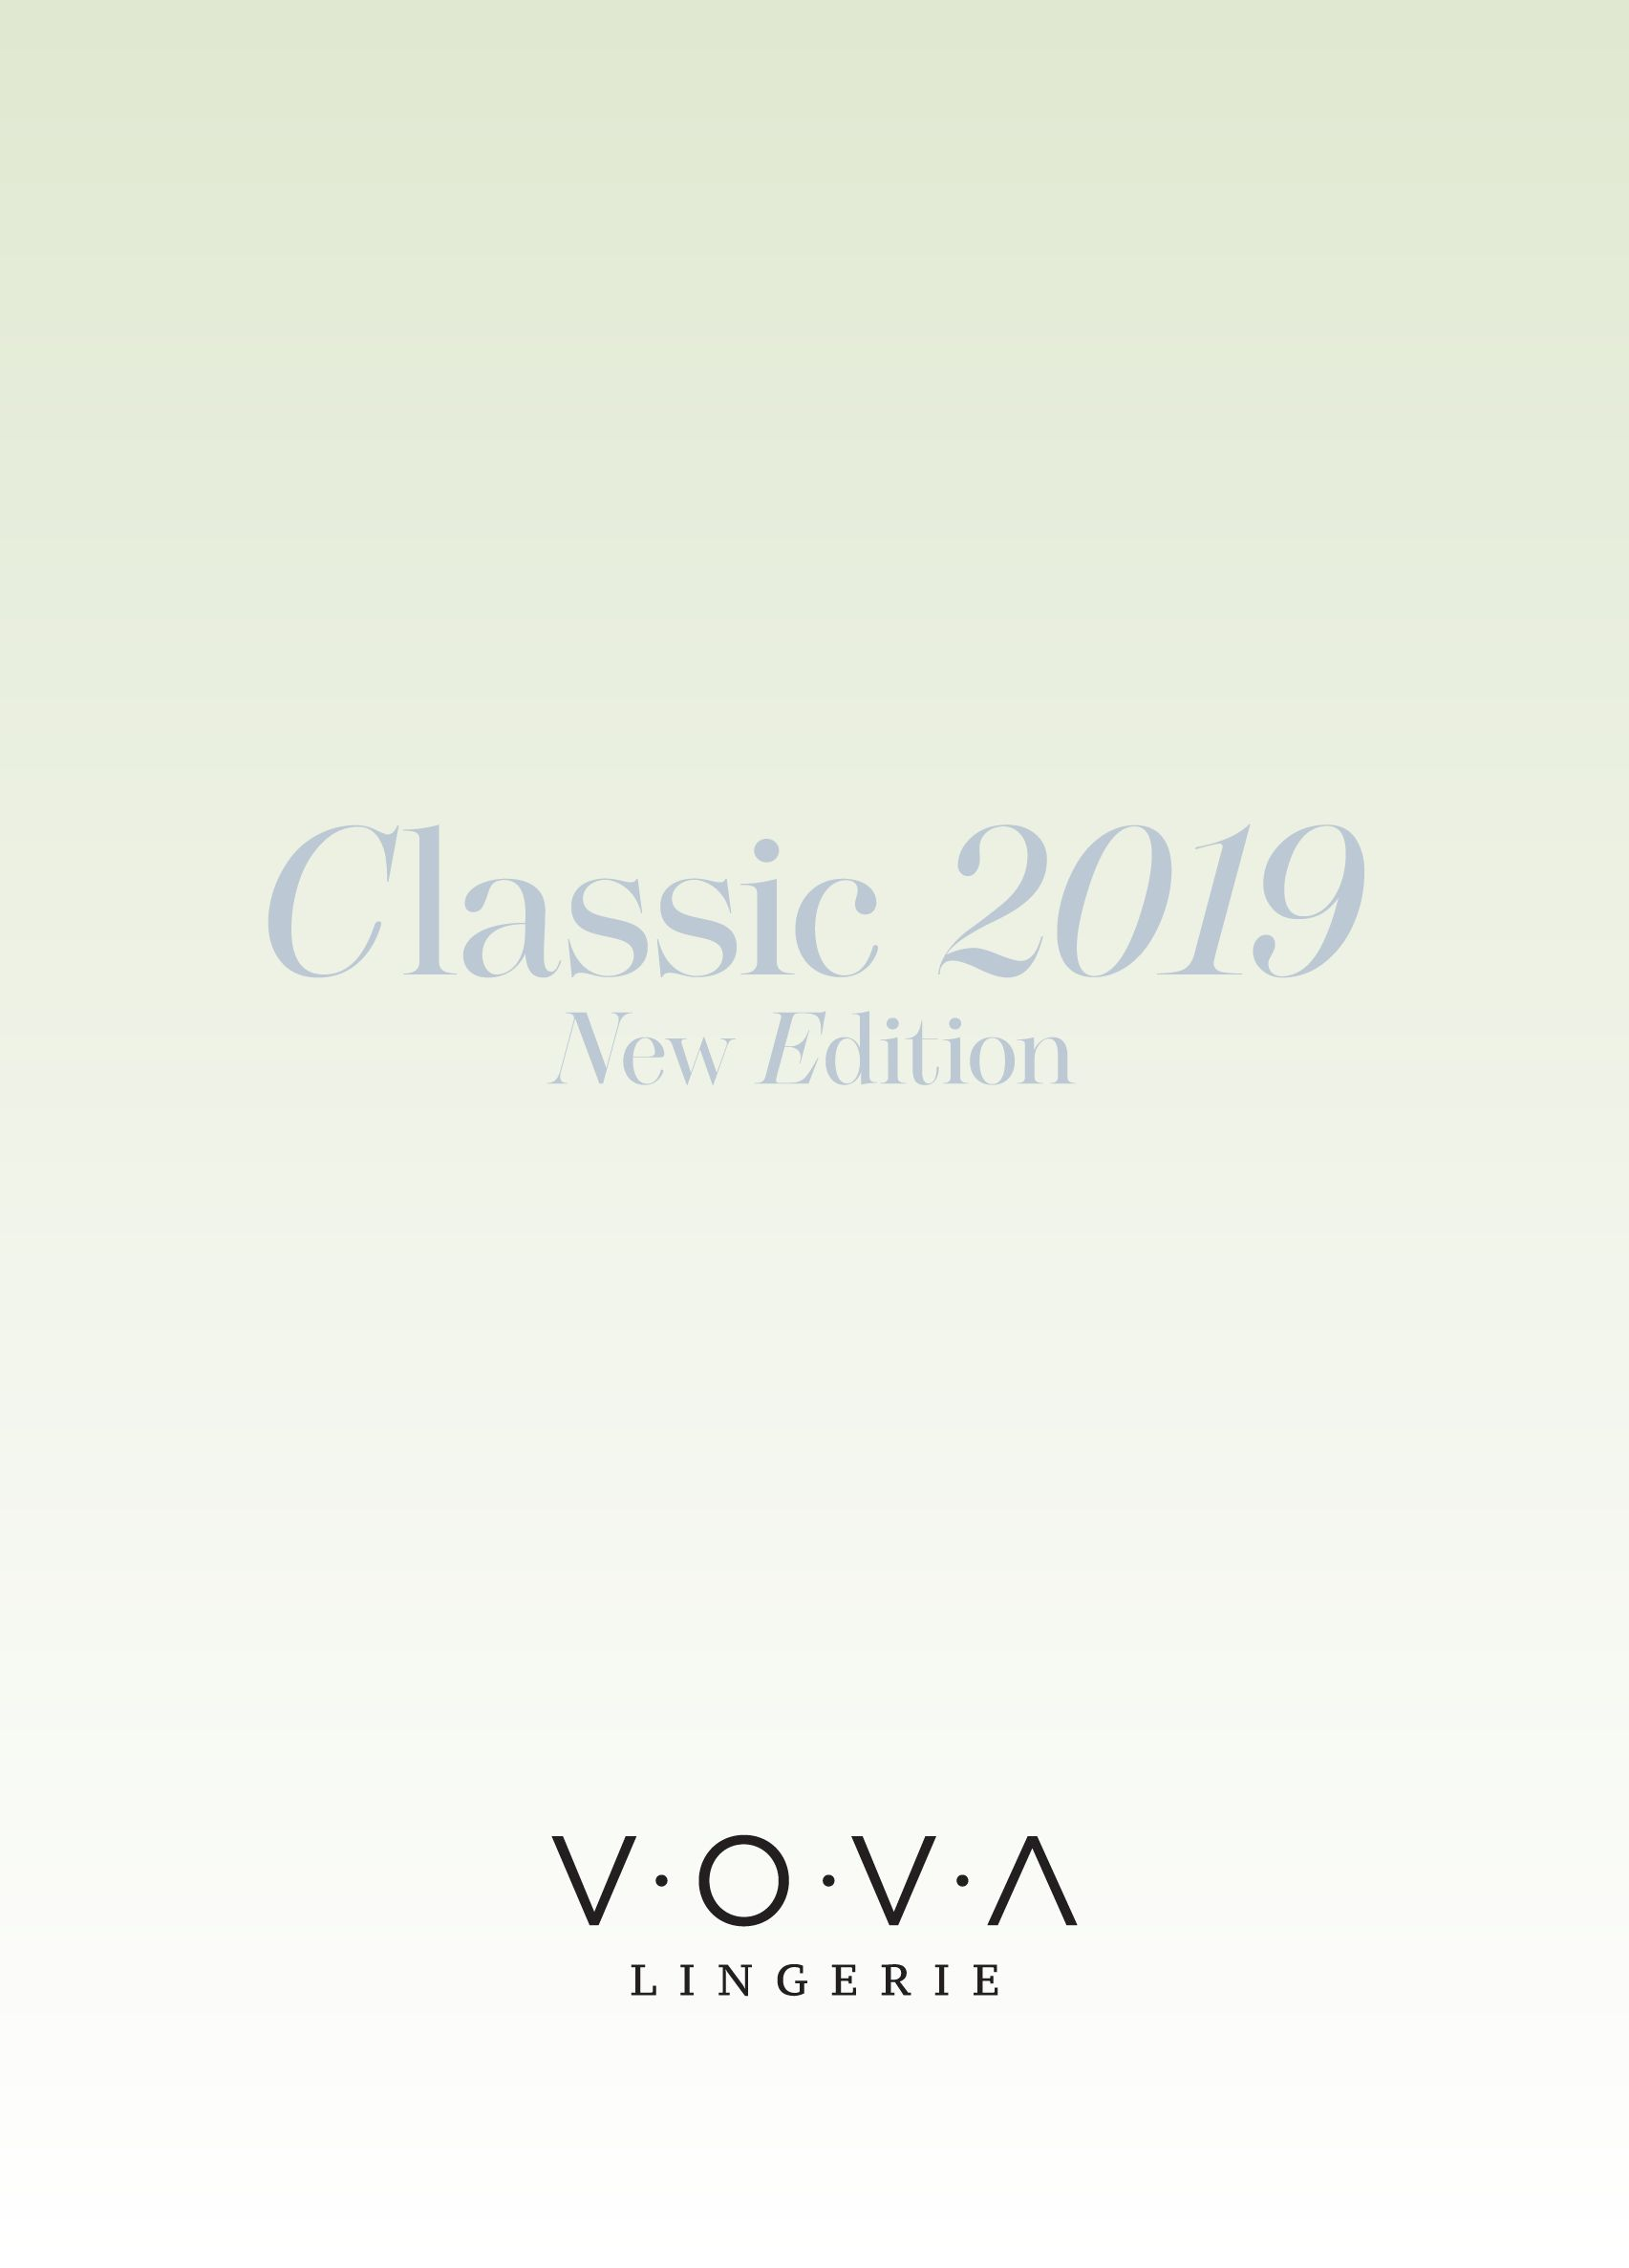 classic2019newedition